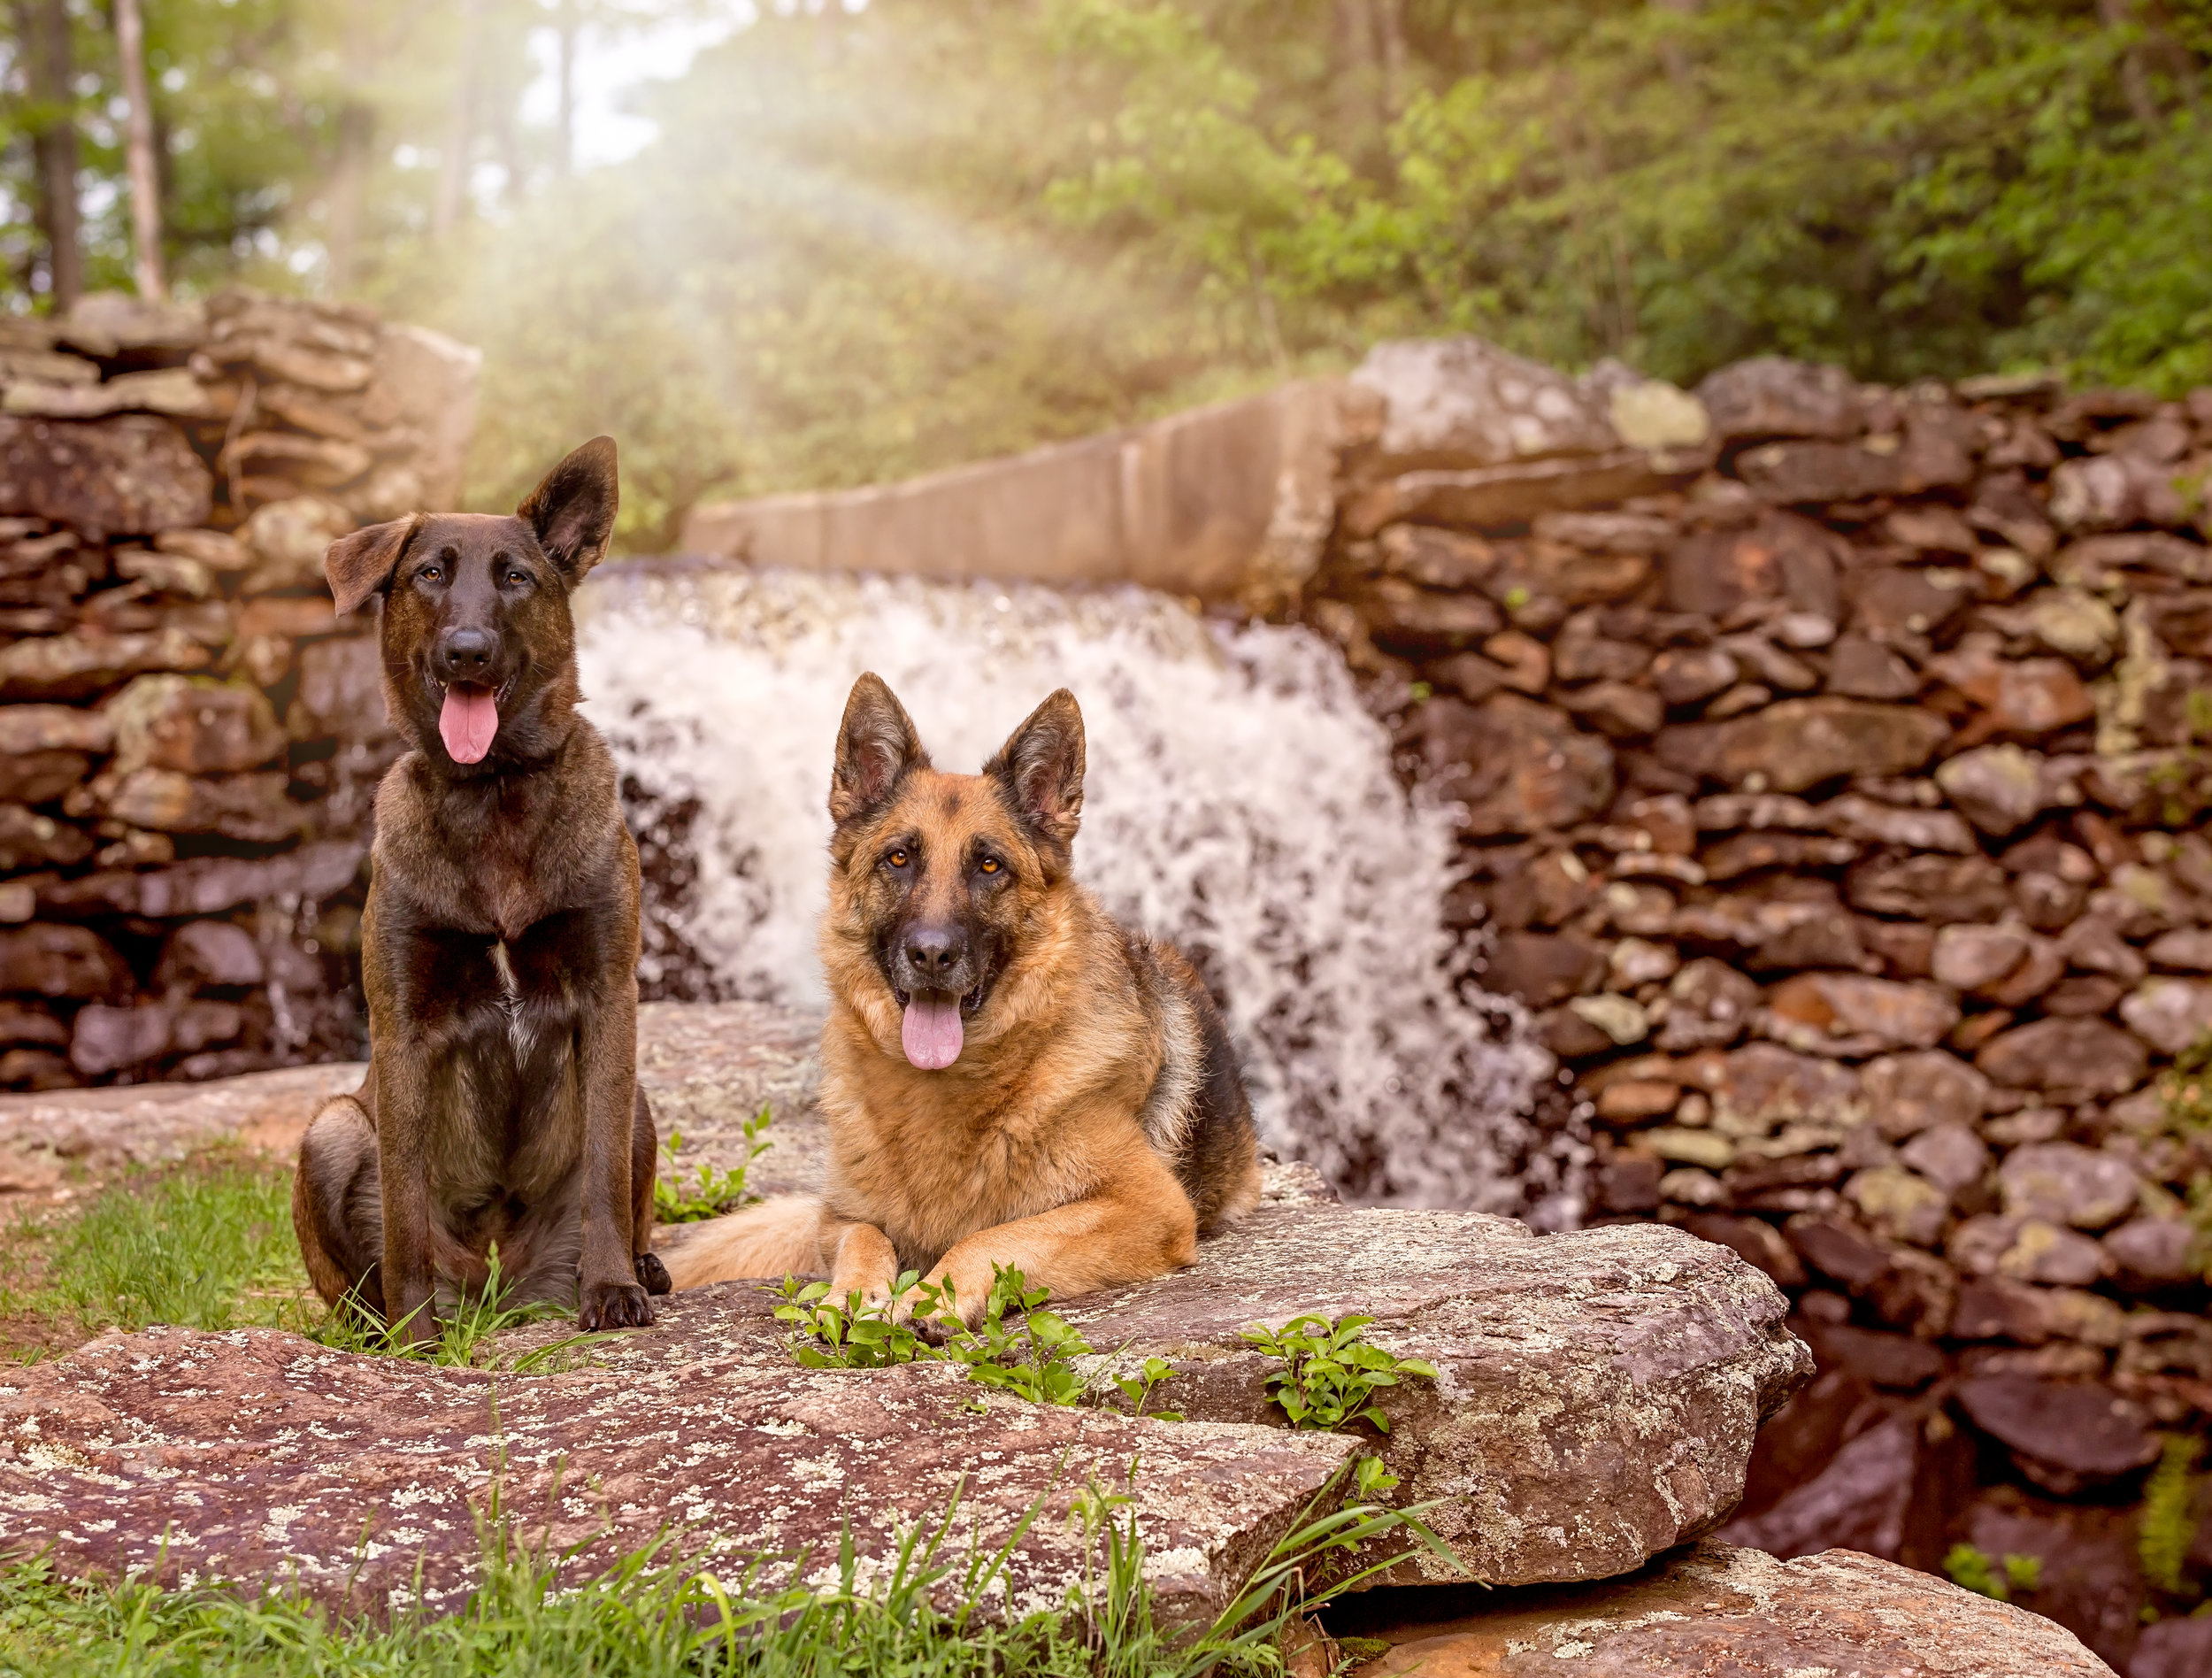 Rescue pet photographer